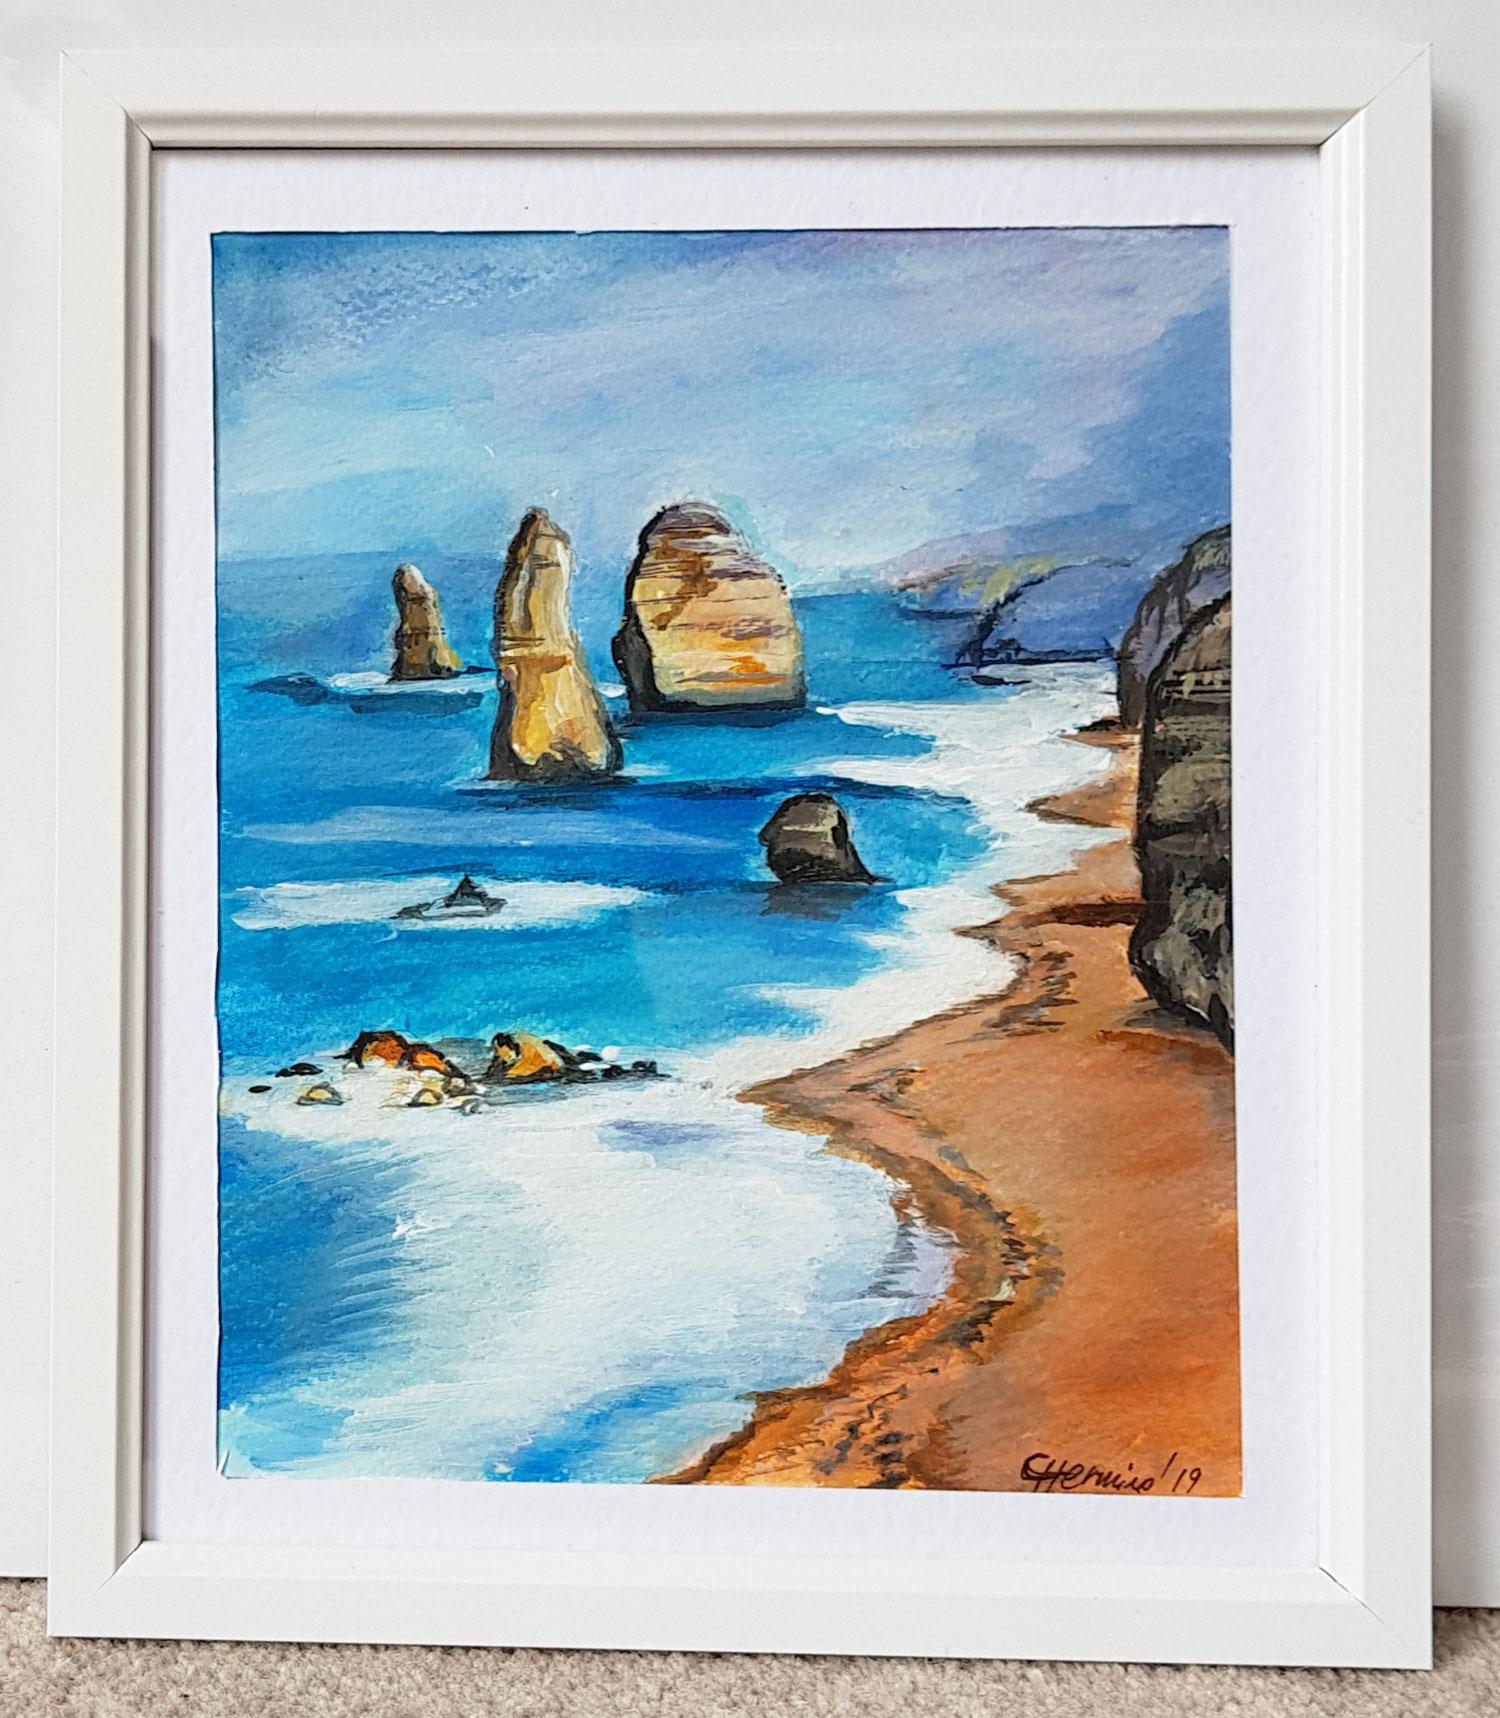 Seascape-oil-on-canvas-sea-rocks---painting-oil-on-canvas-paint